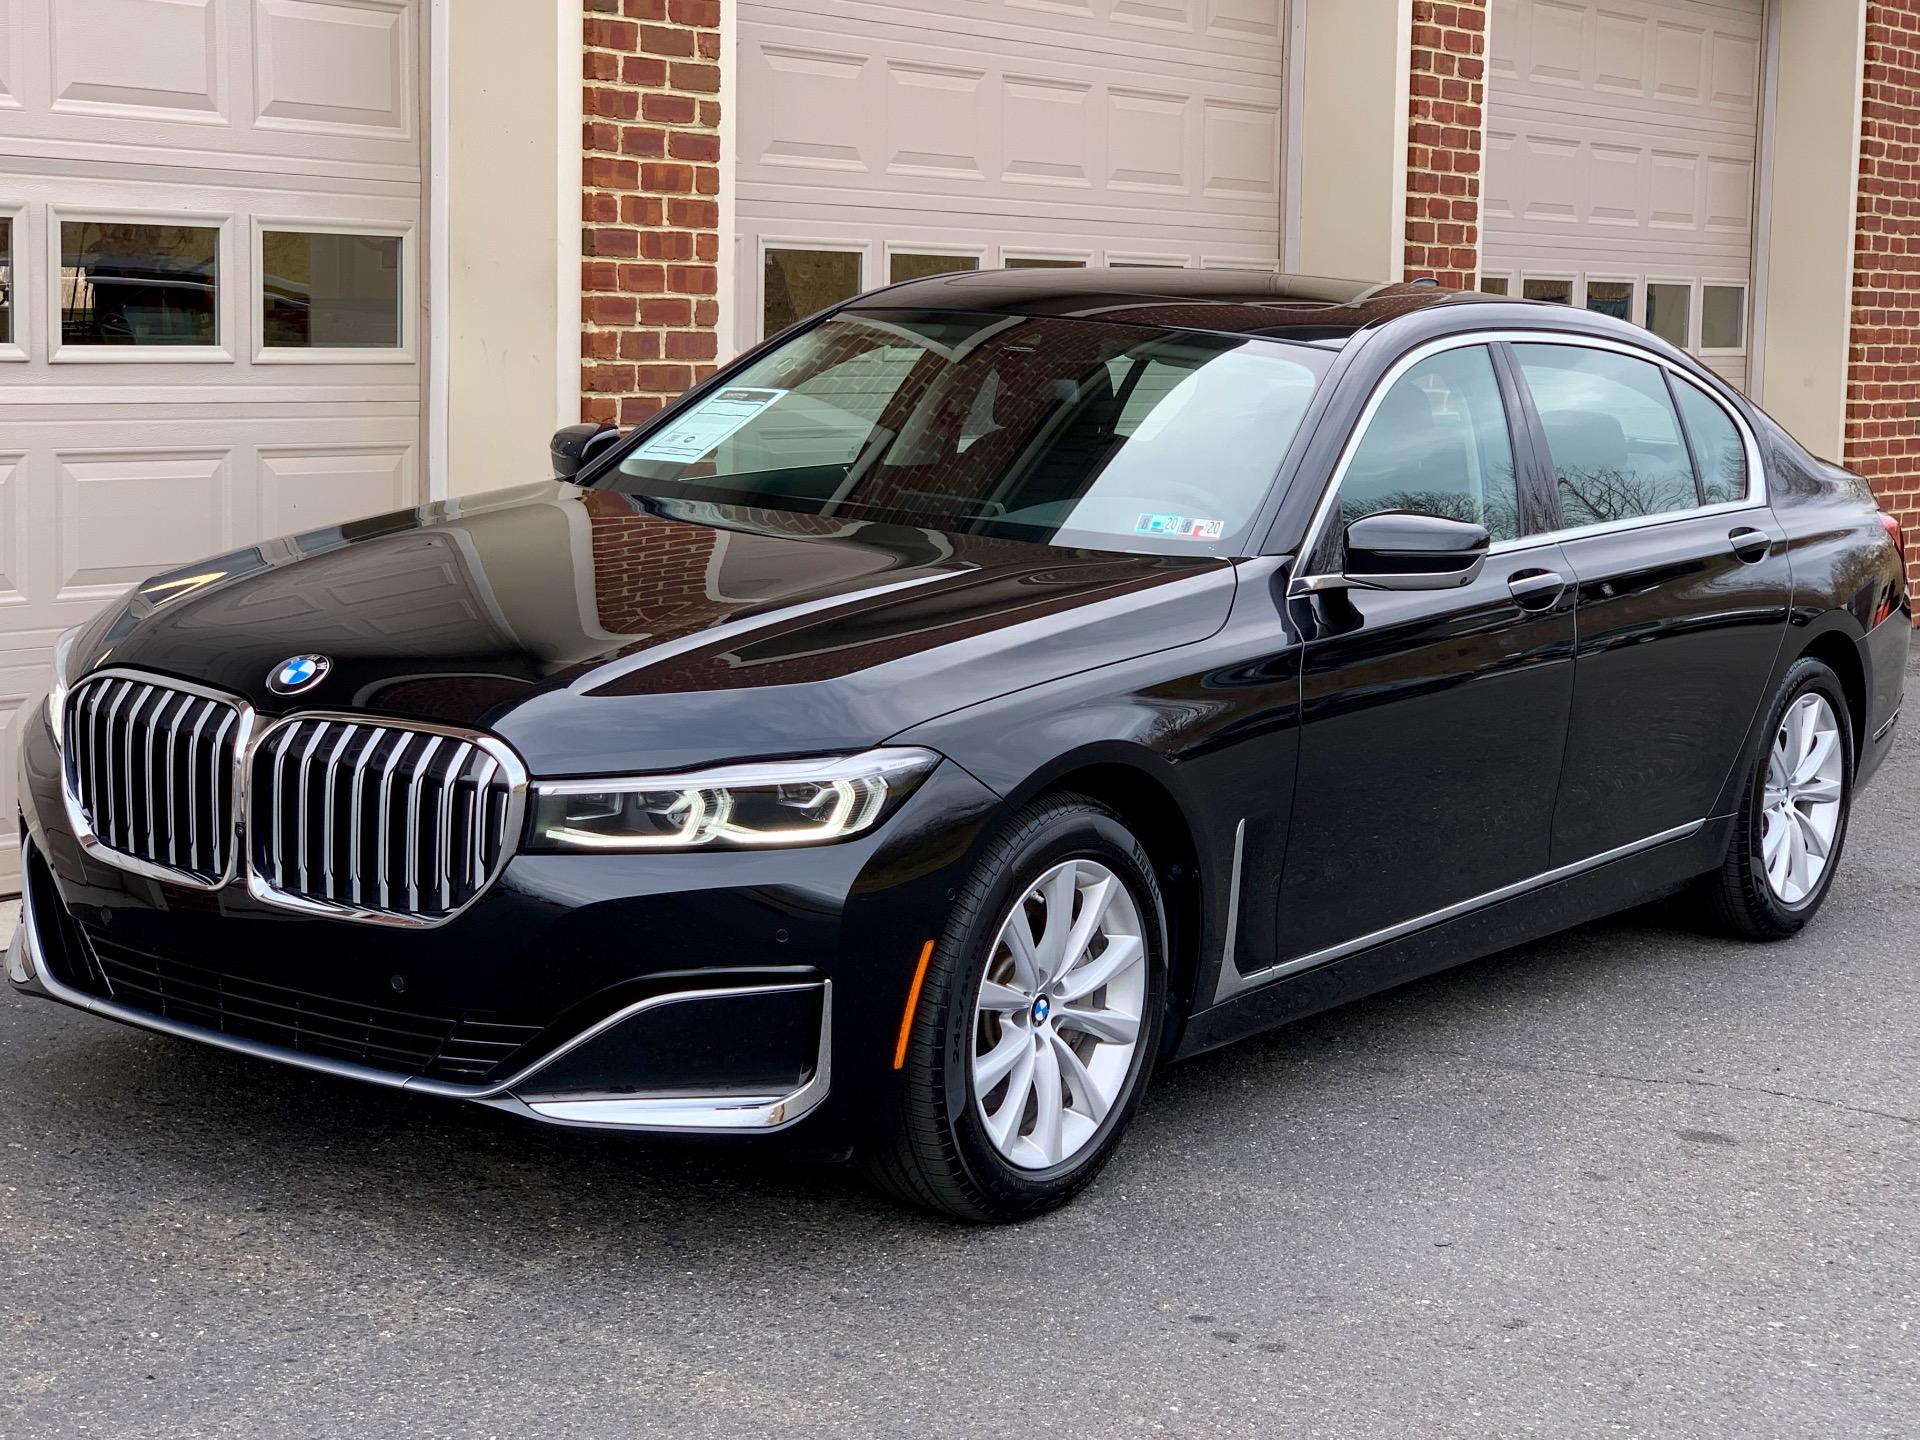 2020 BMW 7 Series 740i xDrive Stock # G62682 for sale near ...